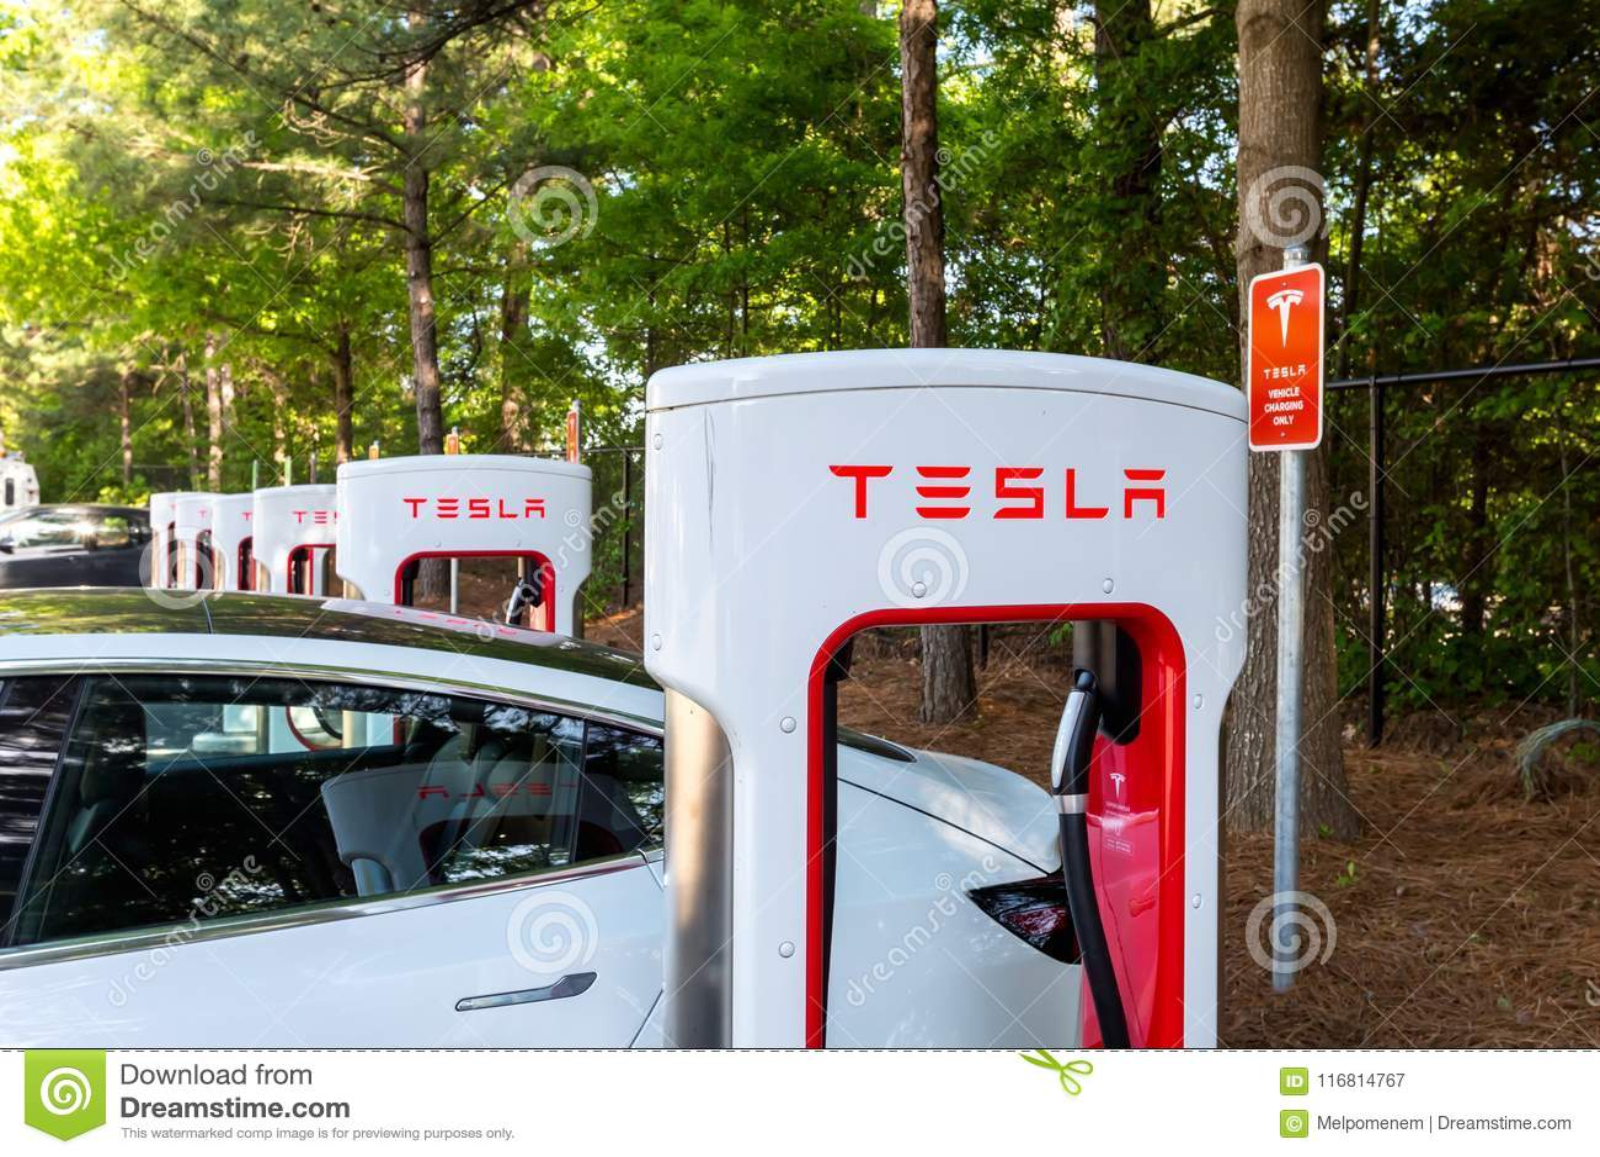 Charging A Tesla Model 3 At A Tesla Supercharger Station In